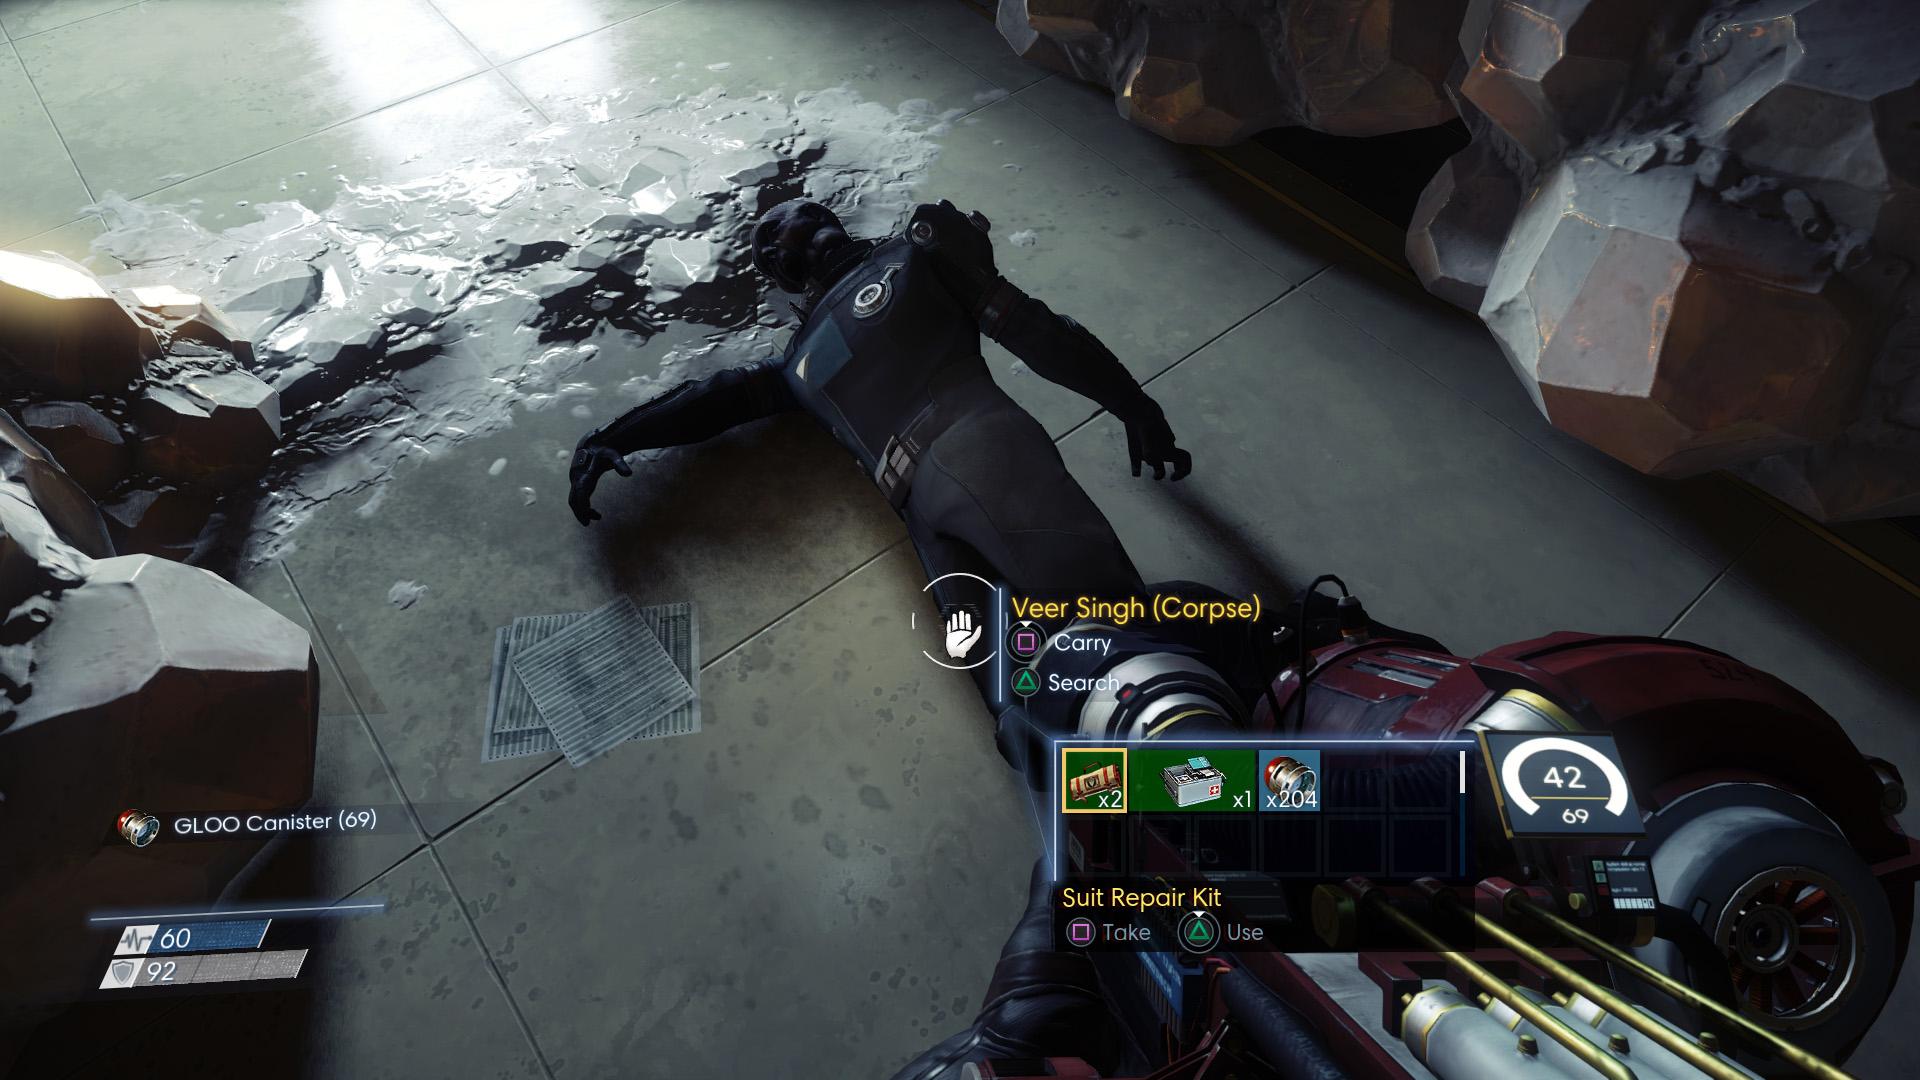 Prey looting corpse